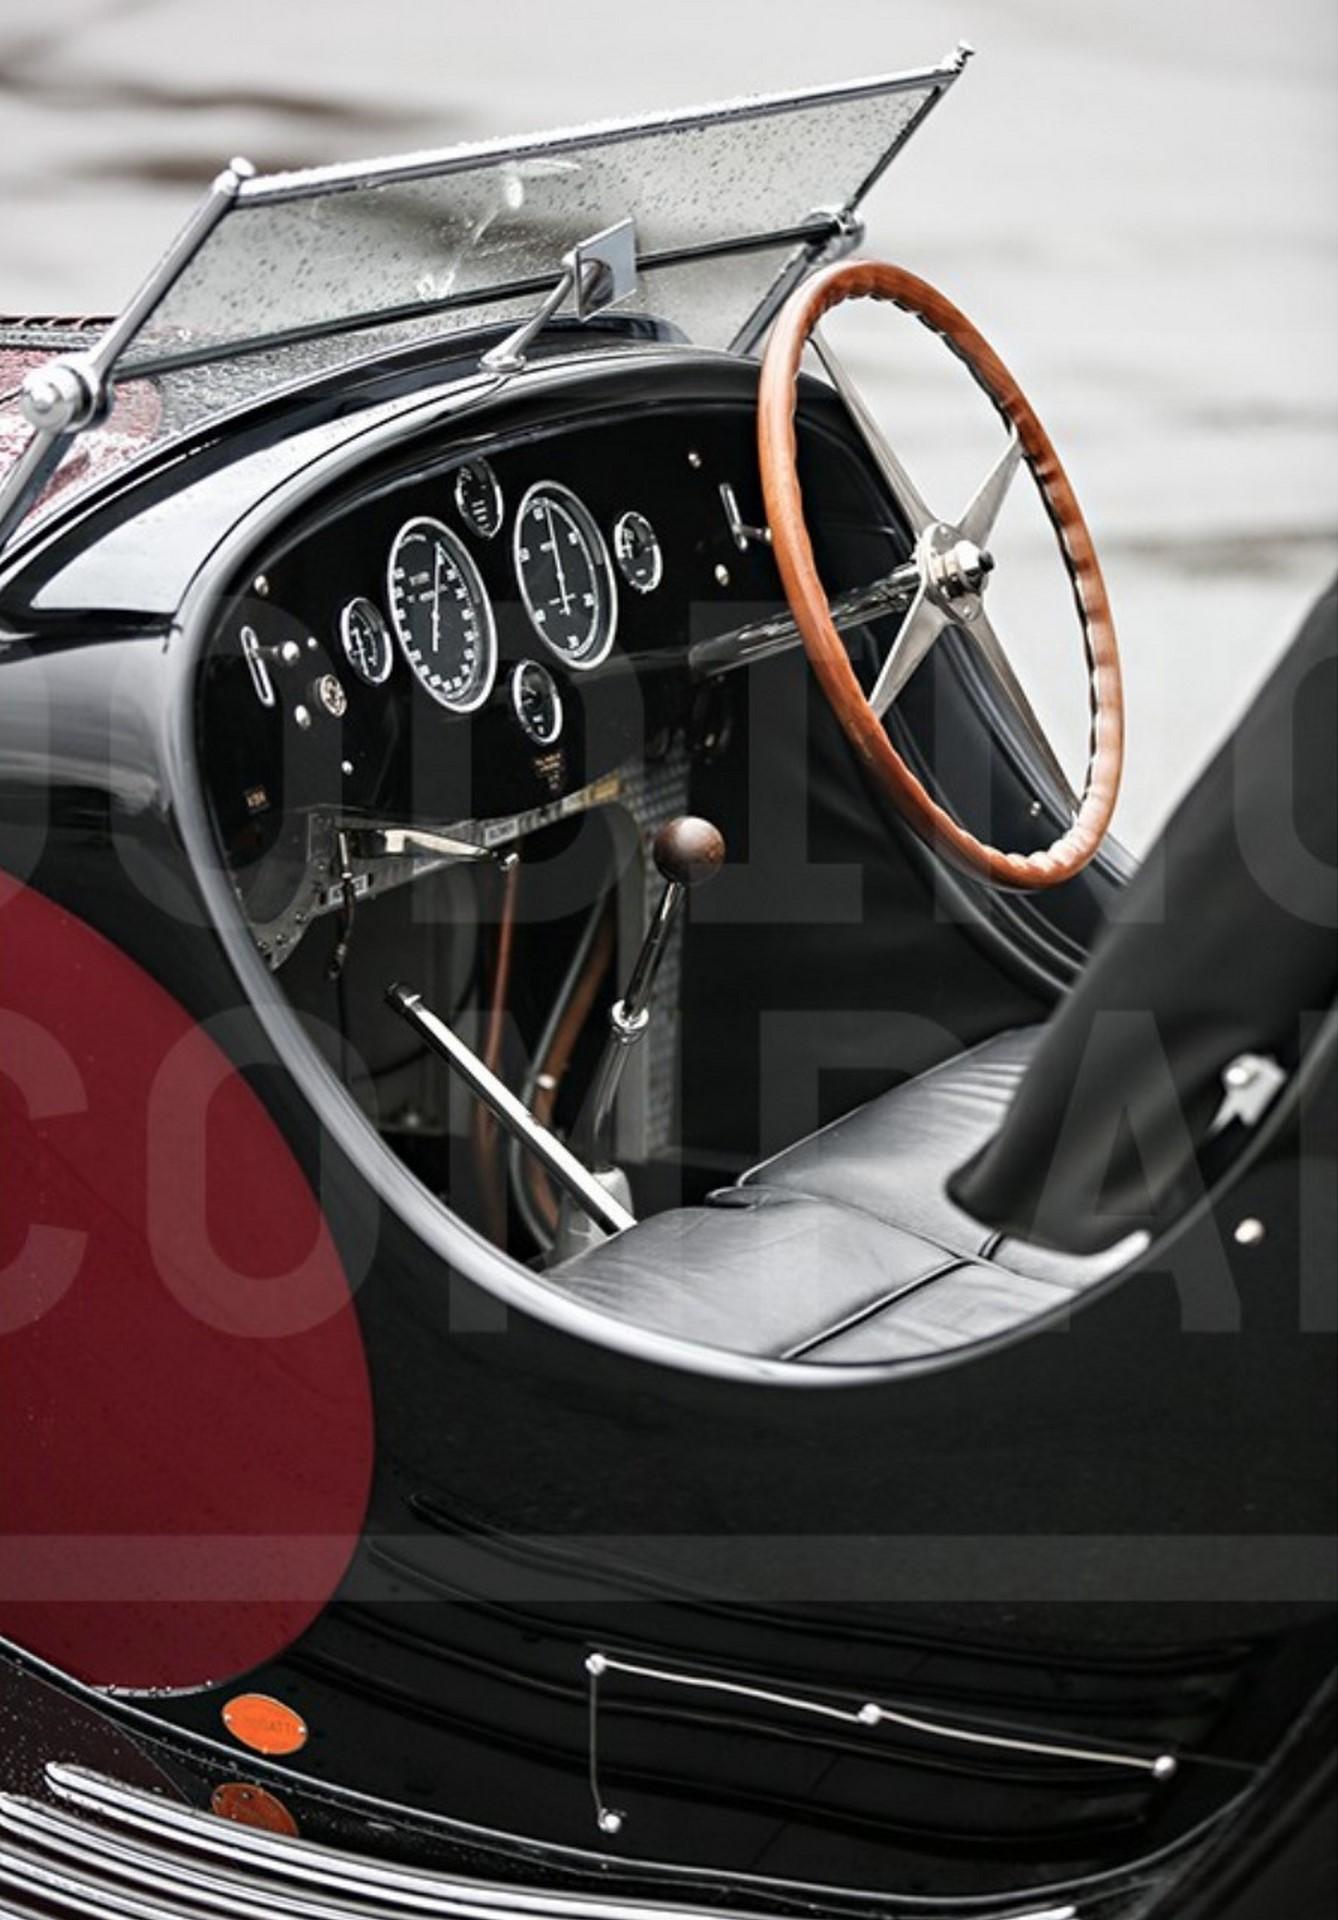 1931 Bugatti Type 55 ford sale (5)